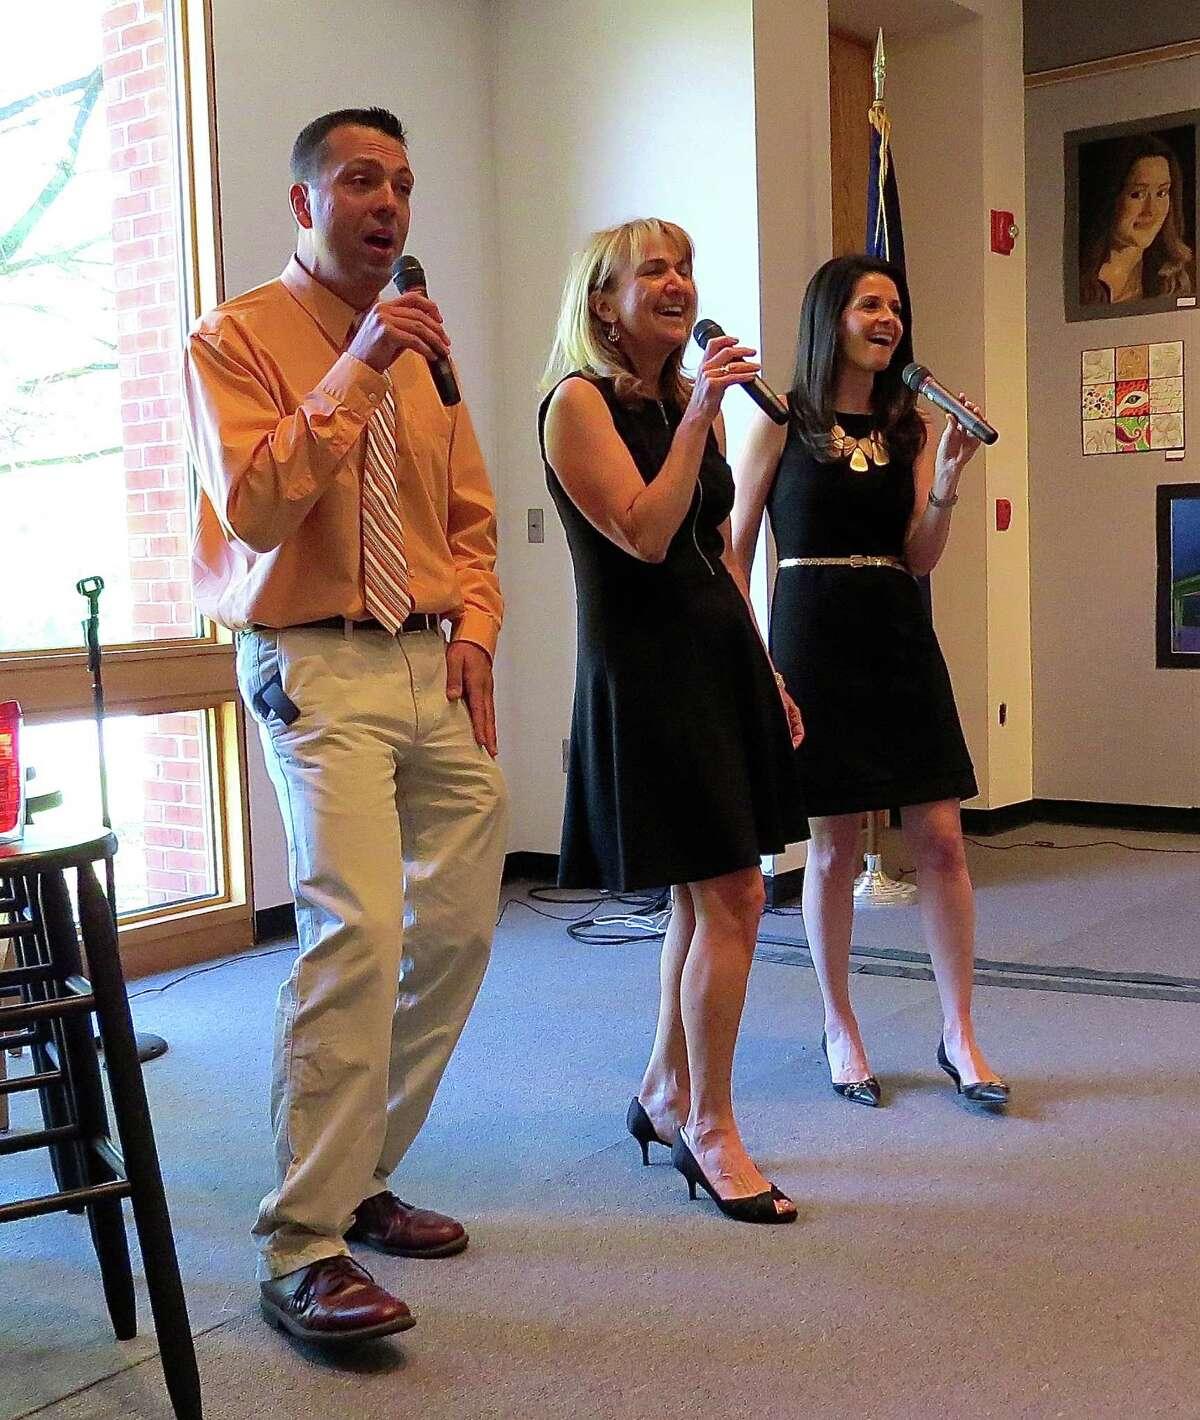 The Singing Anchors: Jerry Gretzinger, Benita Zahn and Jessica Layton.